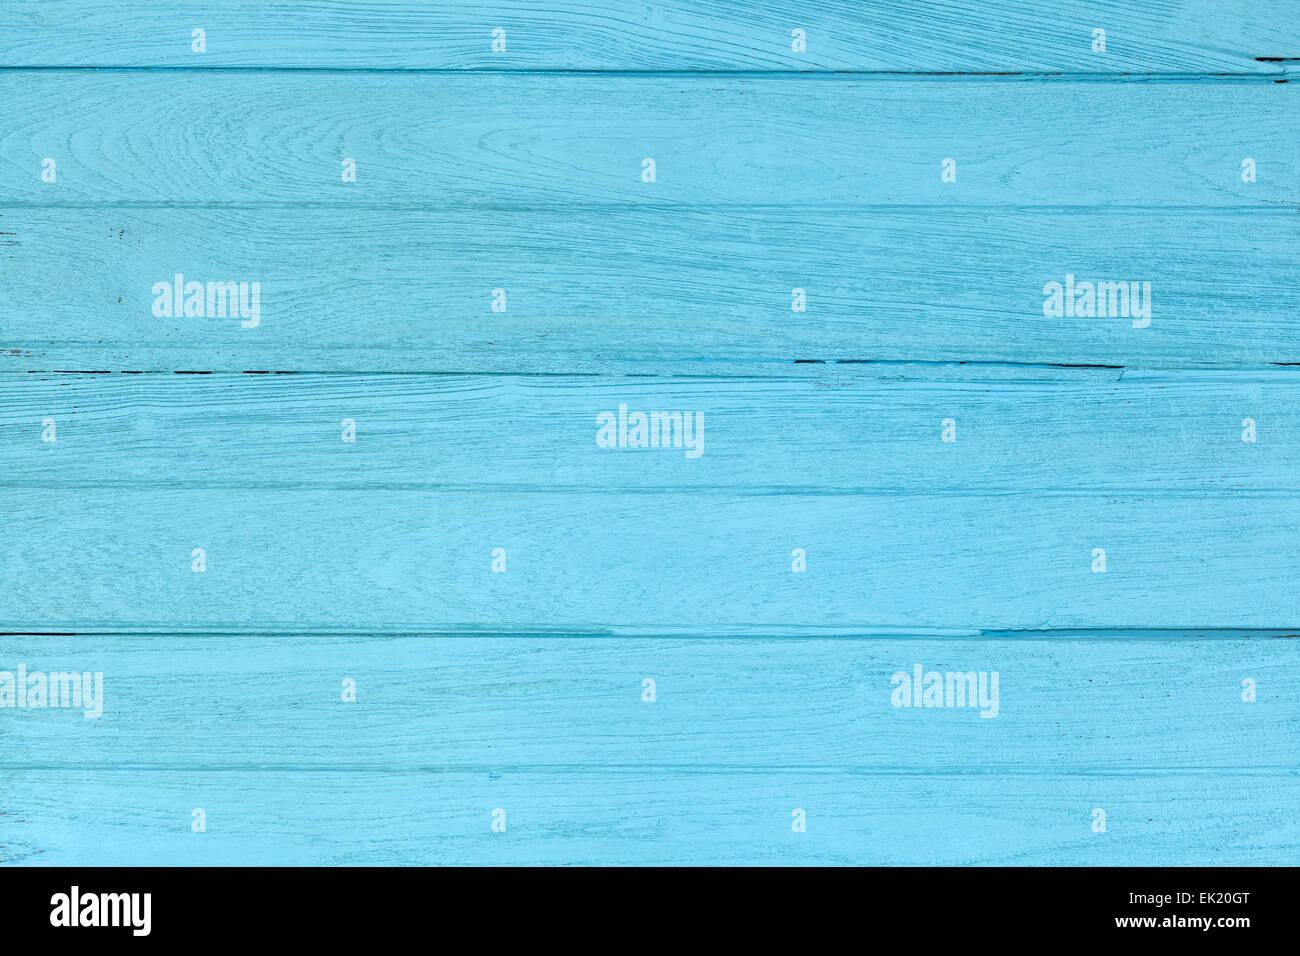 wood  teak blue  background  texture wallpaper - Stock Image